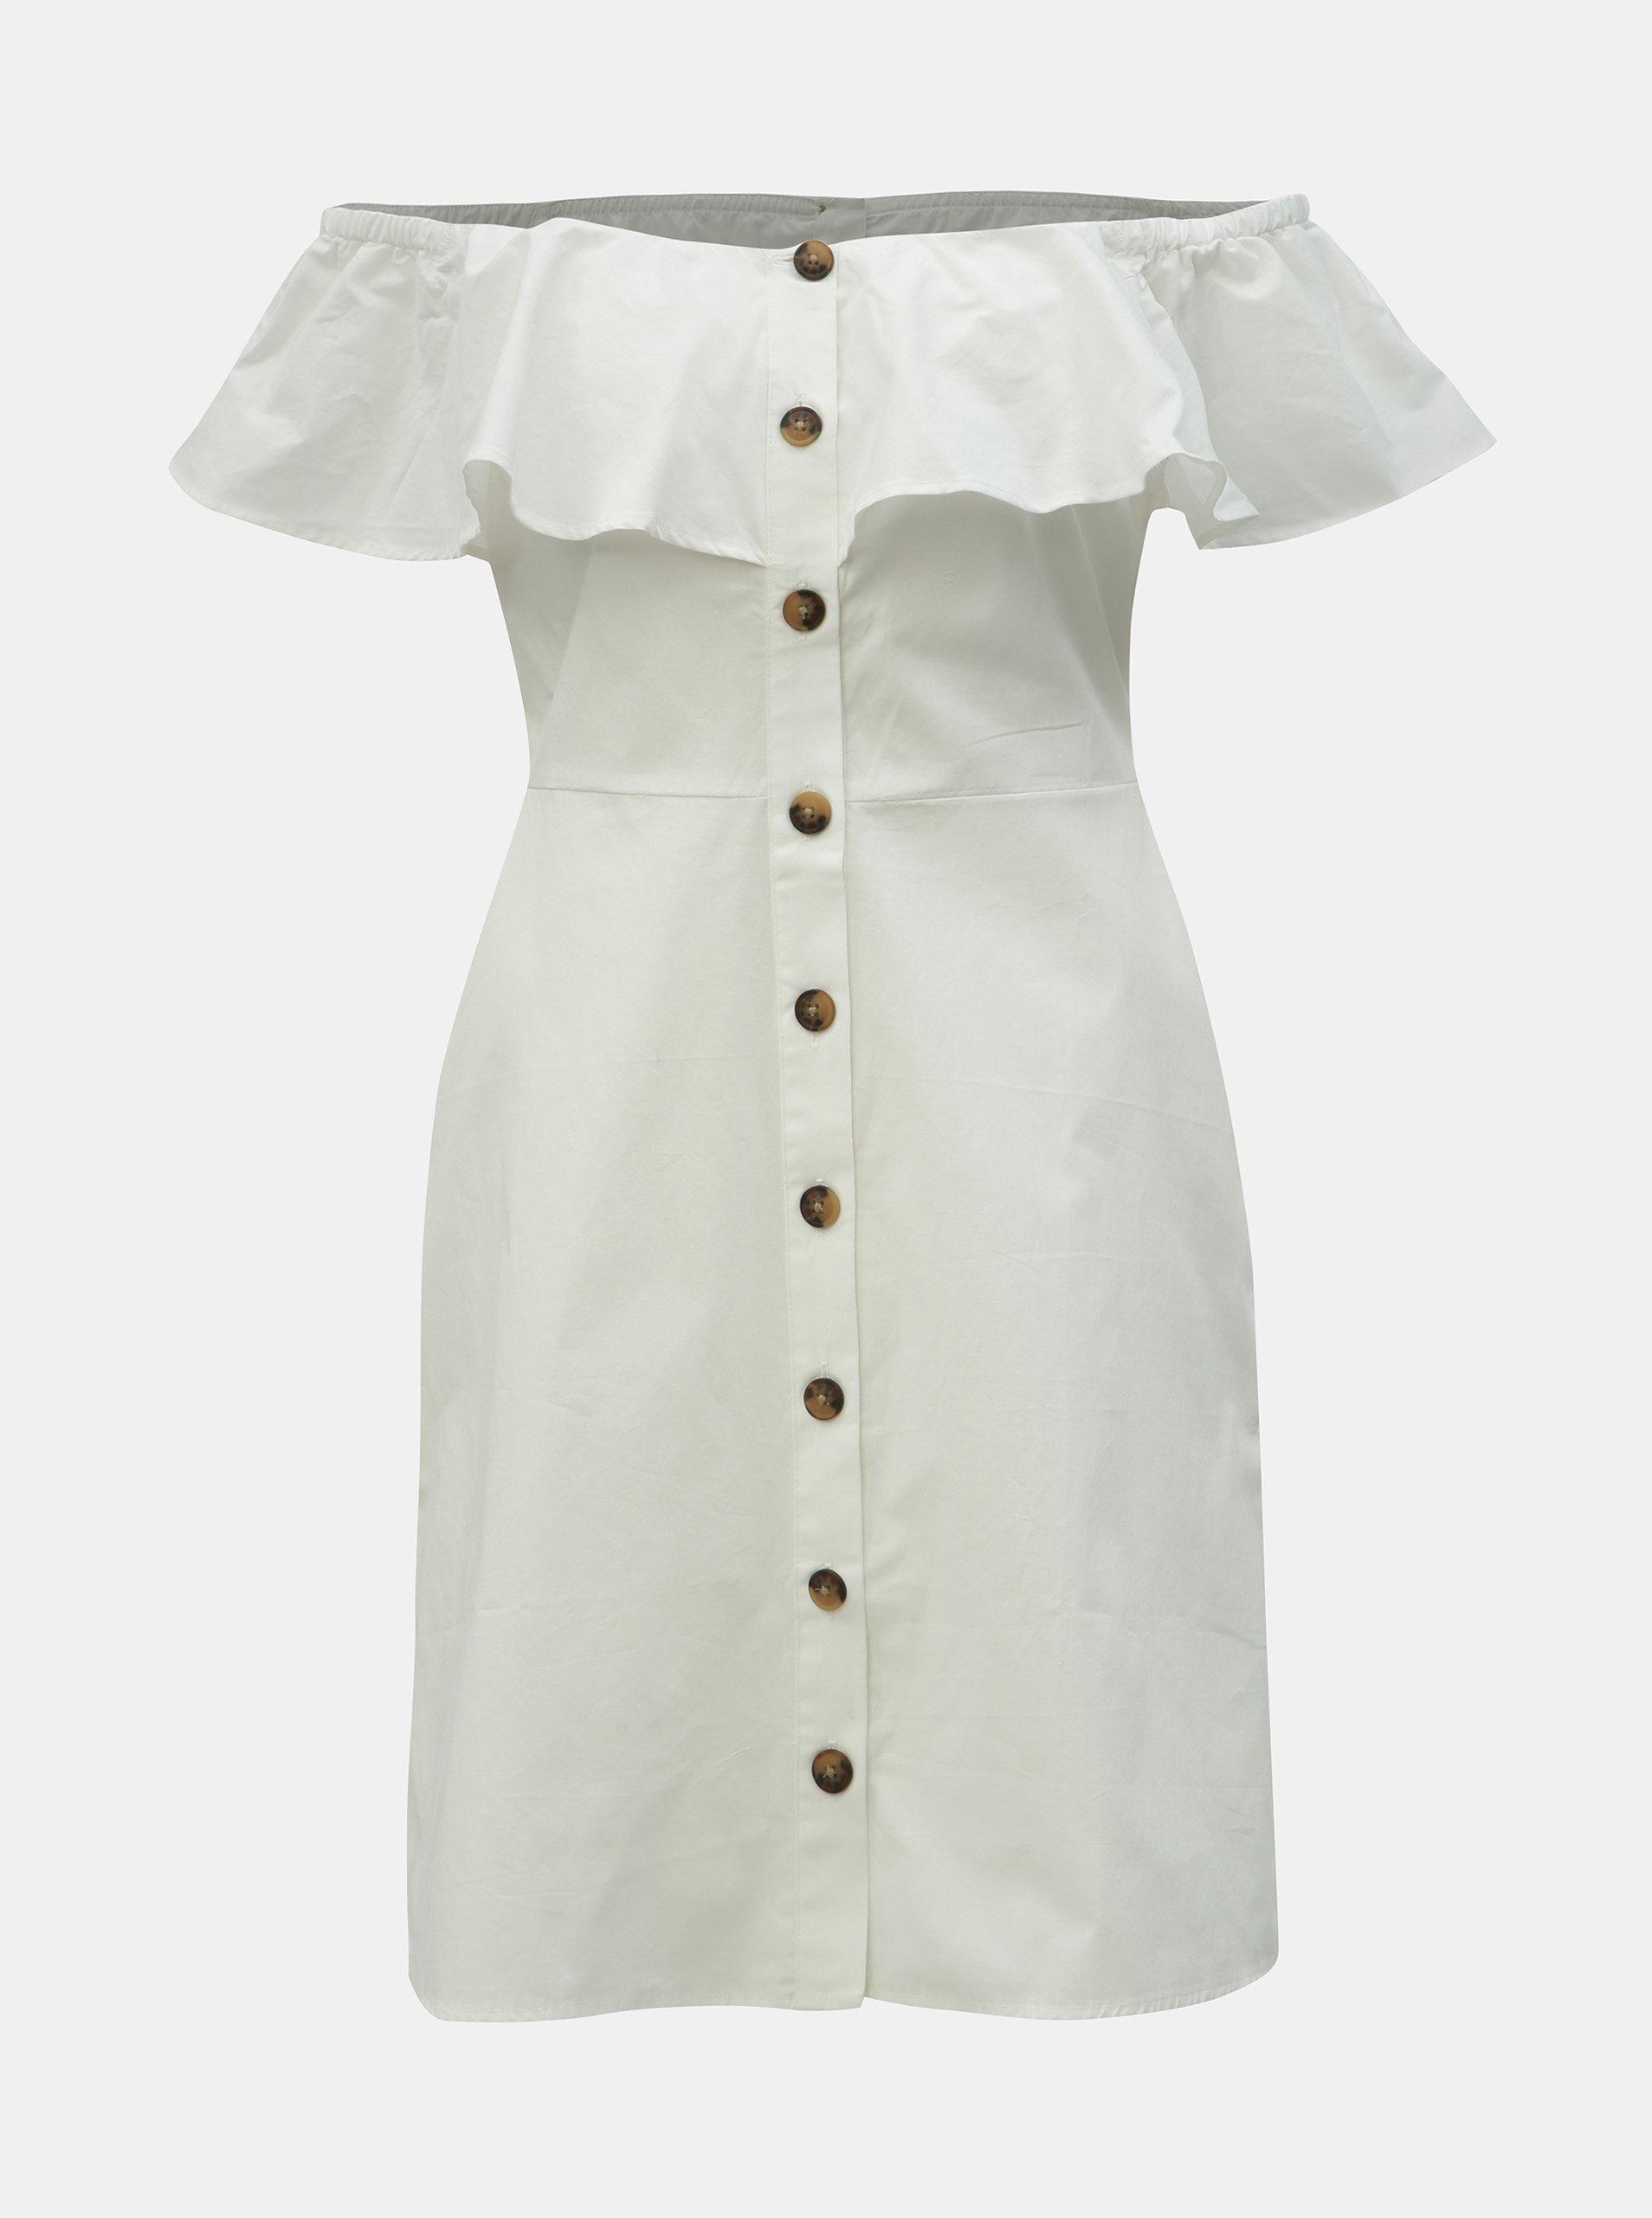 b065b2bc1013 Biele šaty s odhalenými ramenami Dorothy Perkins ...